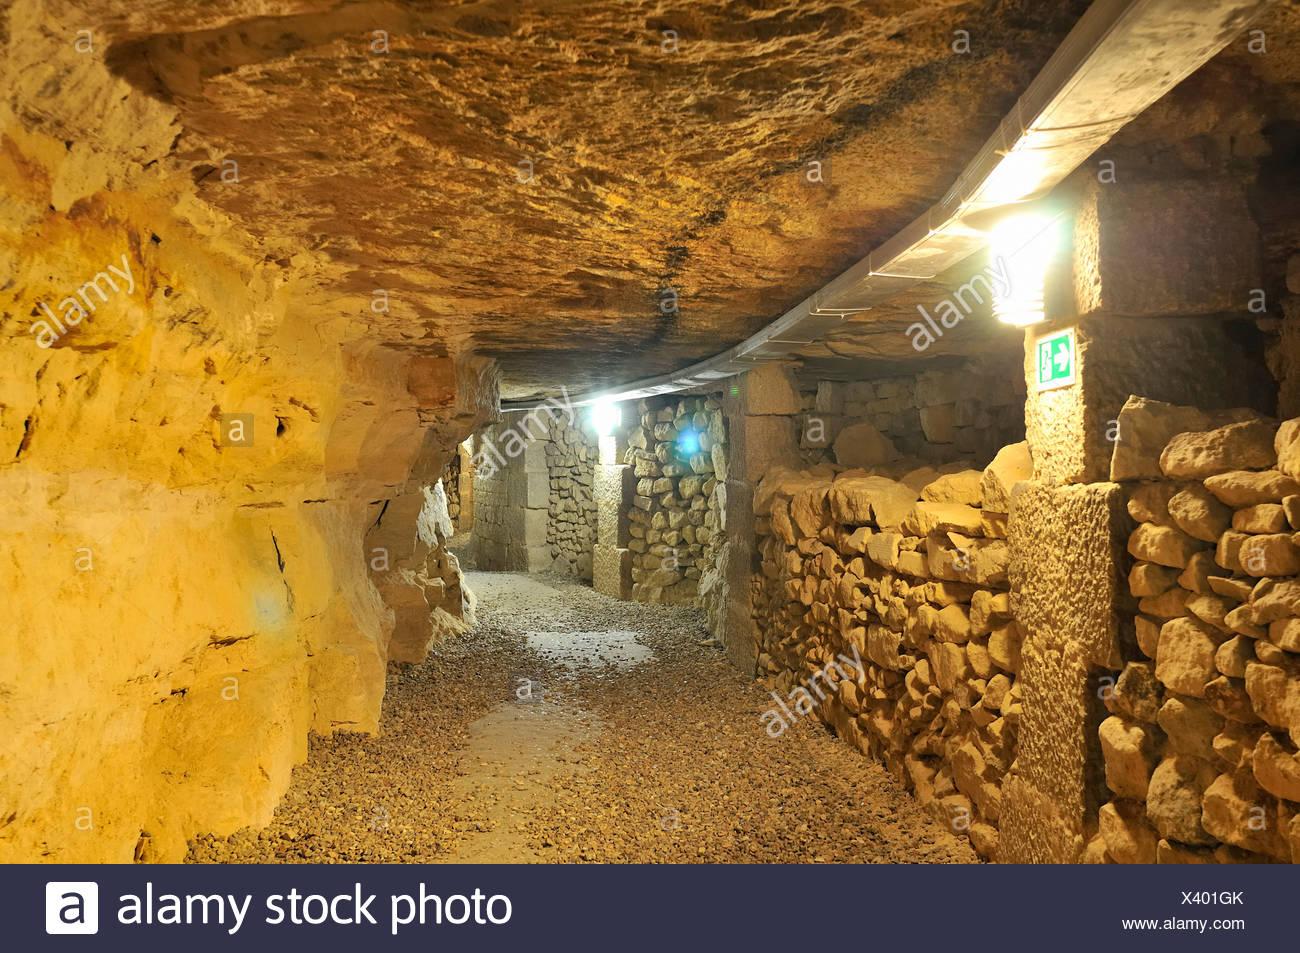 Unter Den Stra En von Paris, e Che, Katakomben - unter den Straßen von Paris, Steinbrüche, Katakomben Stockfoto